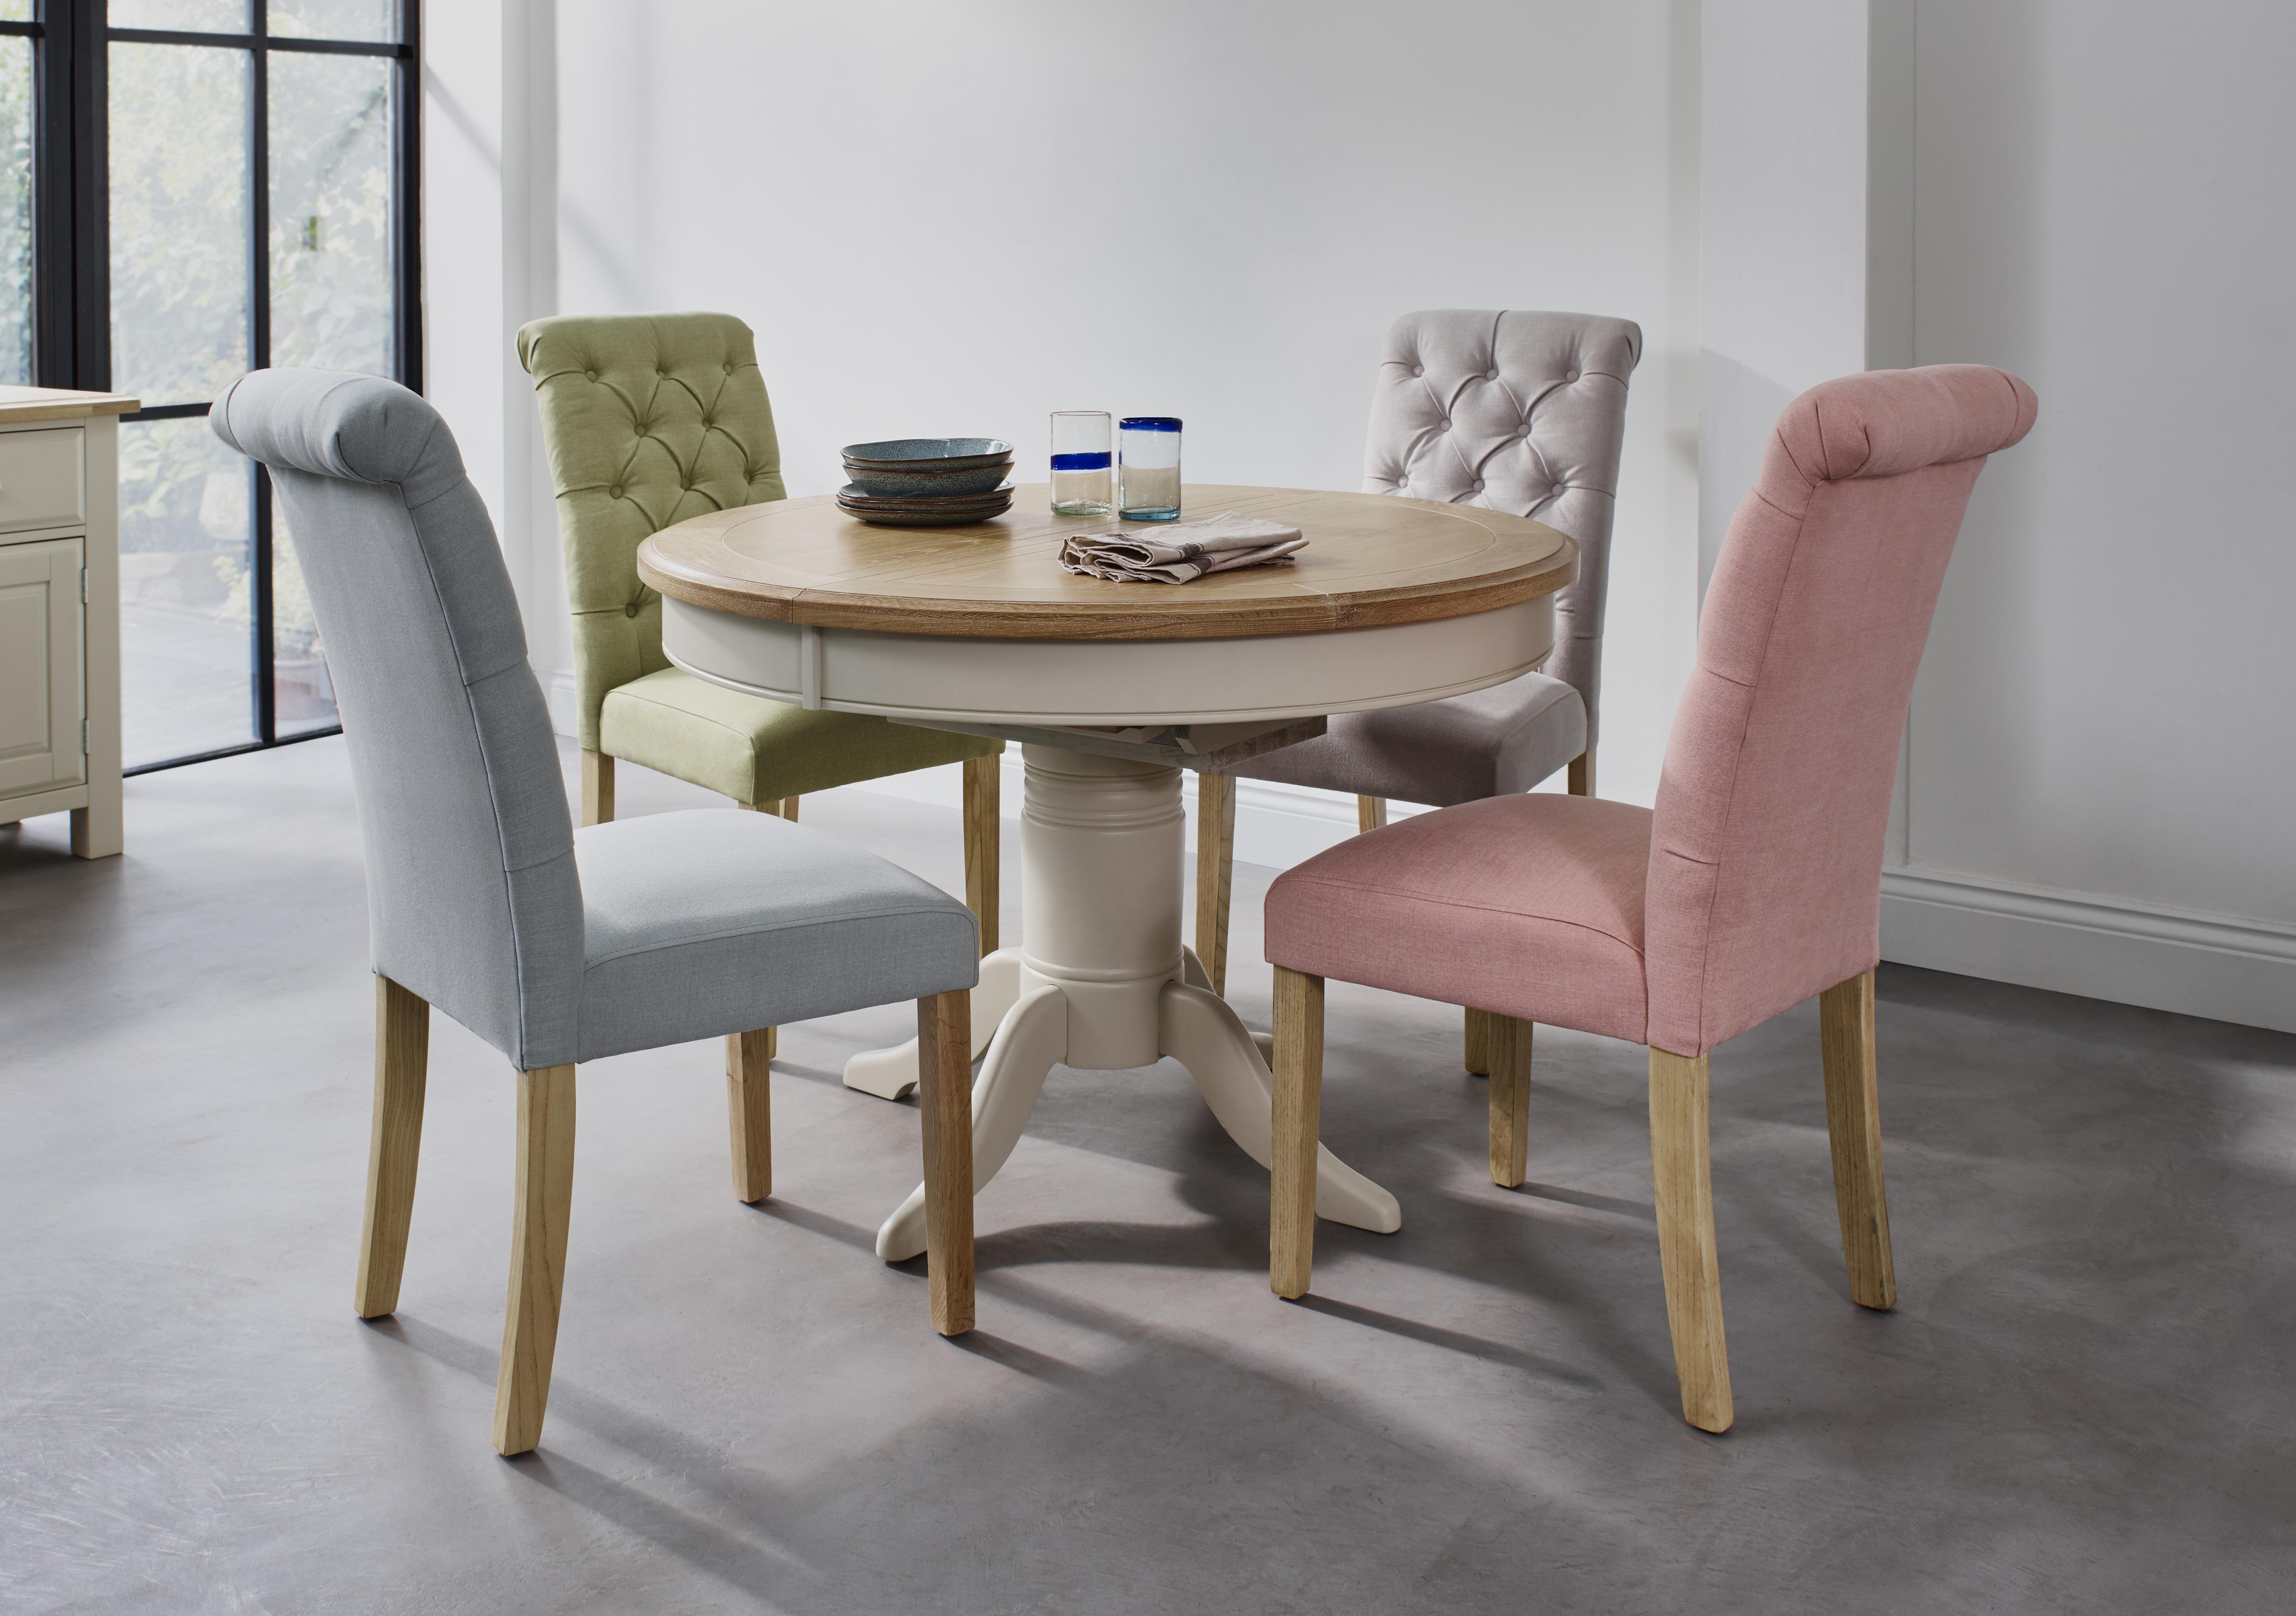 Furniture Village & Dining Tables - Full Collection - Furniture Village